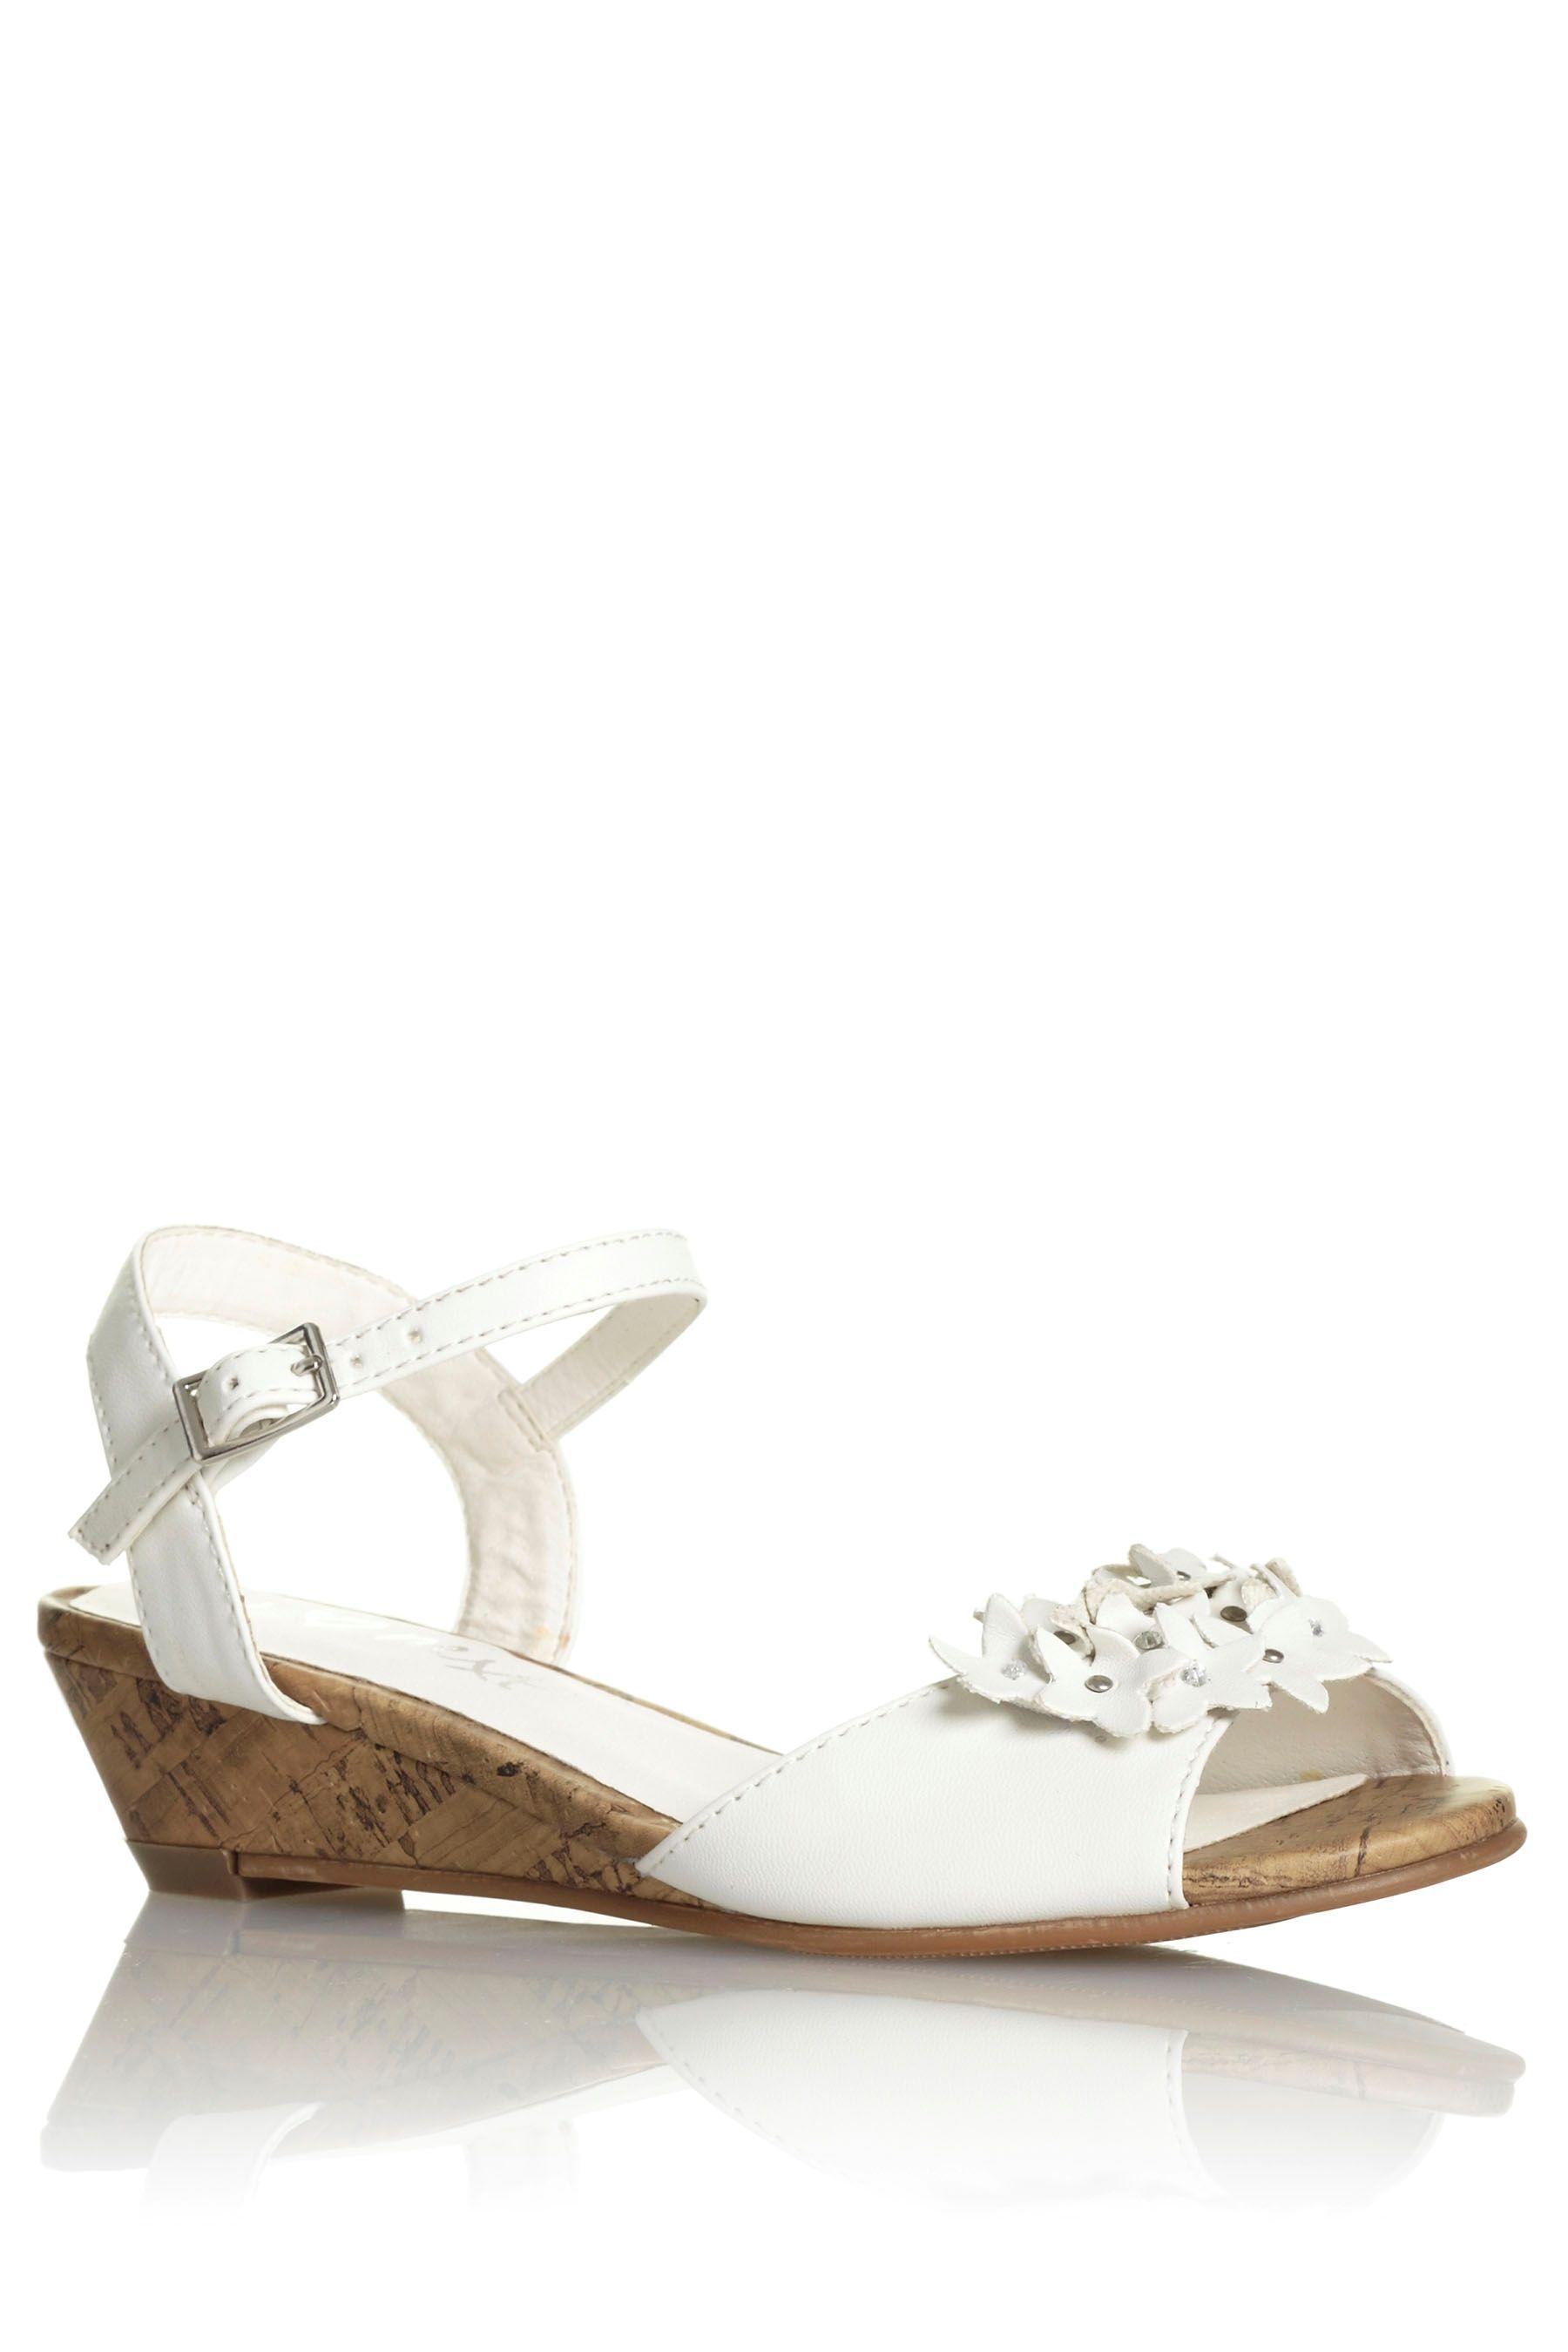 28+ White wedge wedding shoes uk ideas in 2021